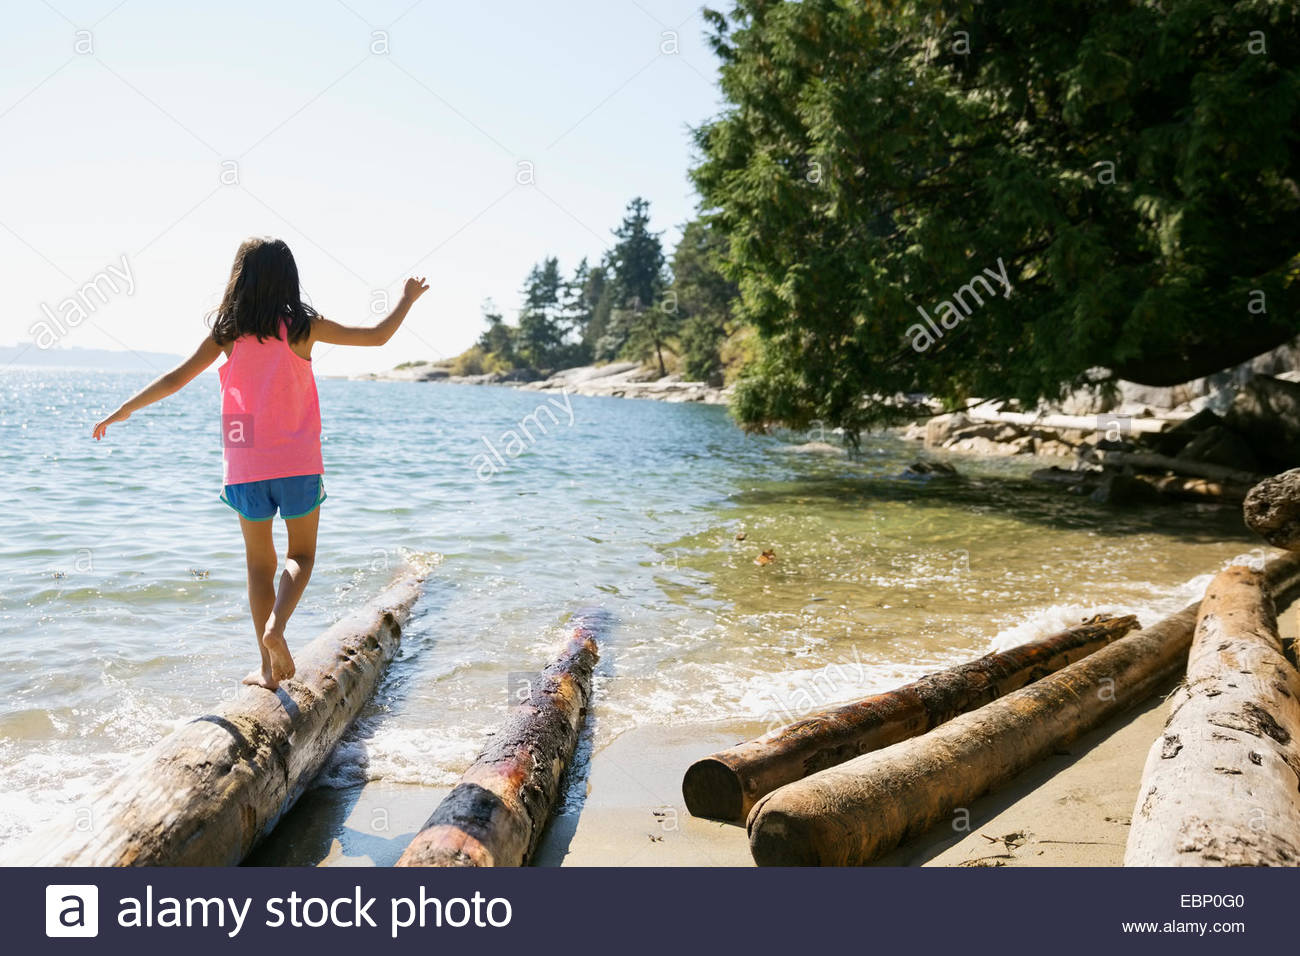 Girl balancing on driftwood at beach - Stock Image